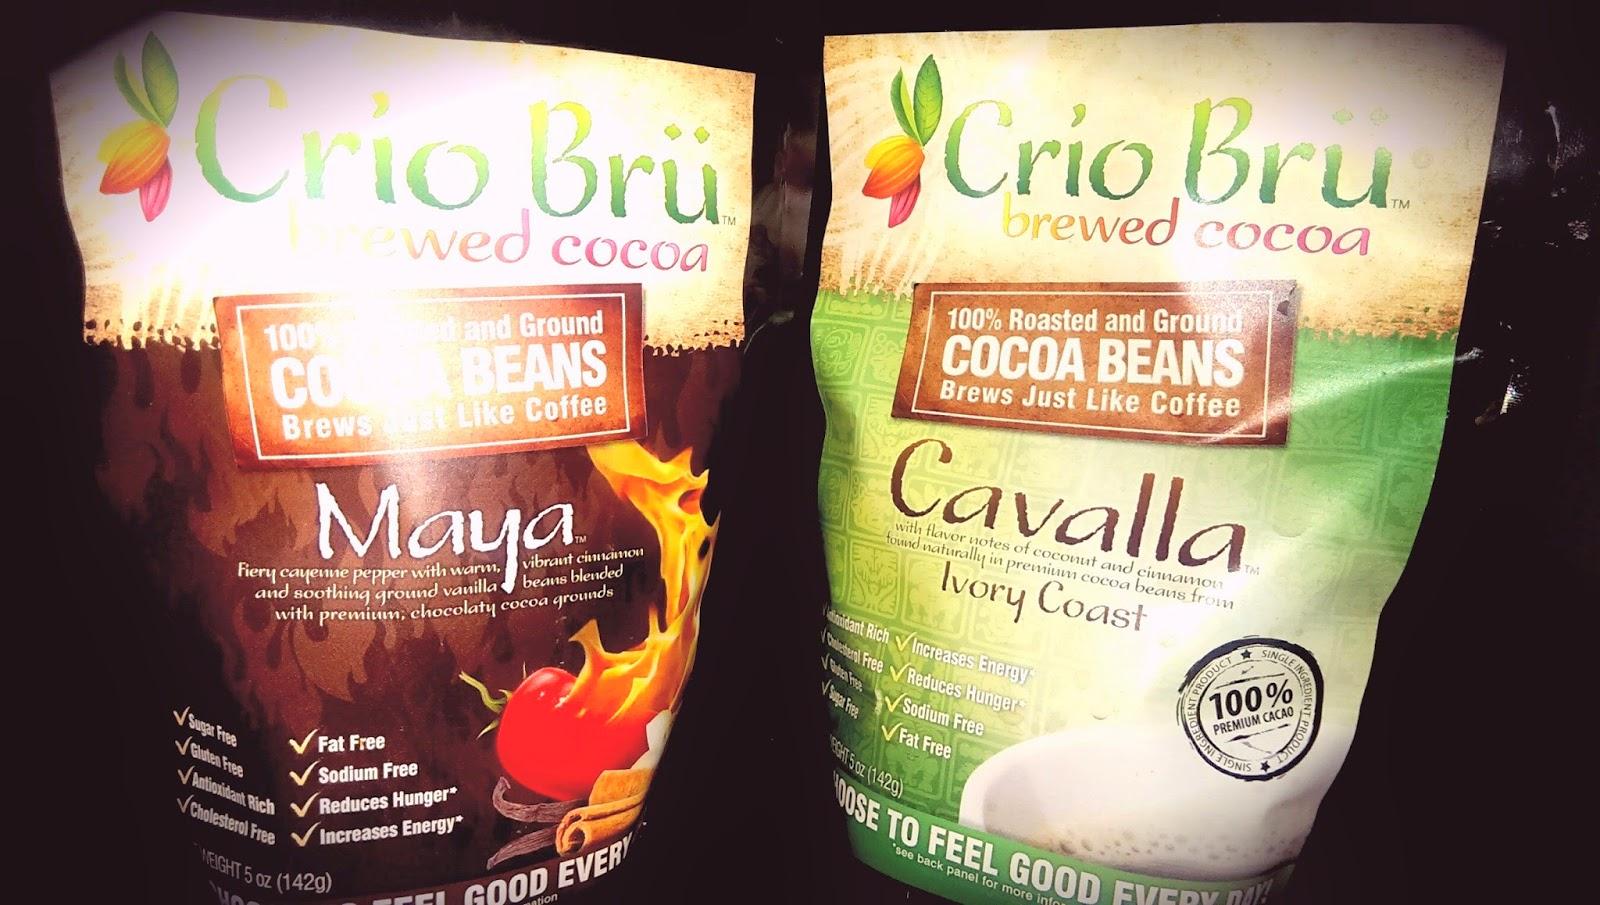 Crio+Bru Crio Bru Review- Brewed Cocoa